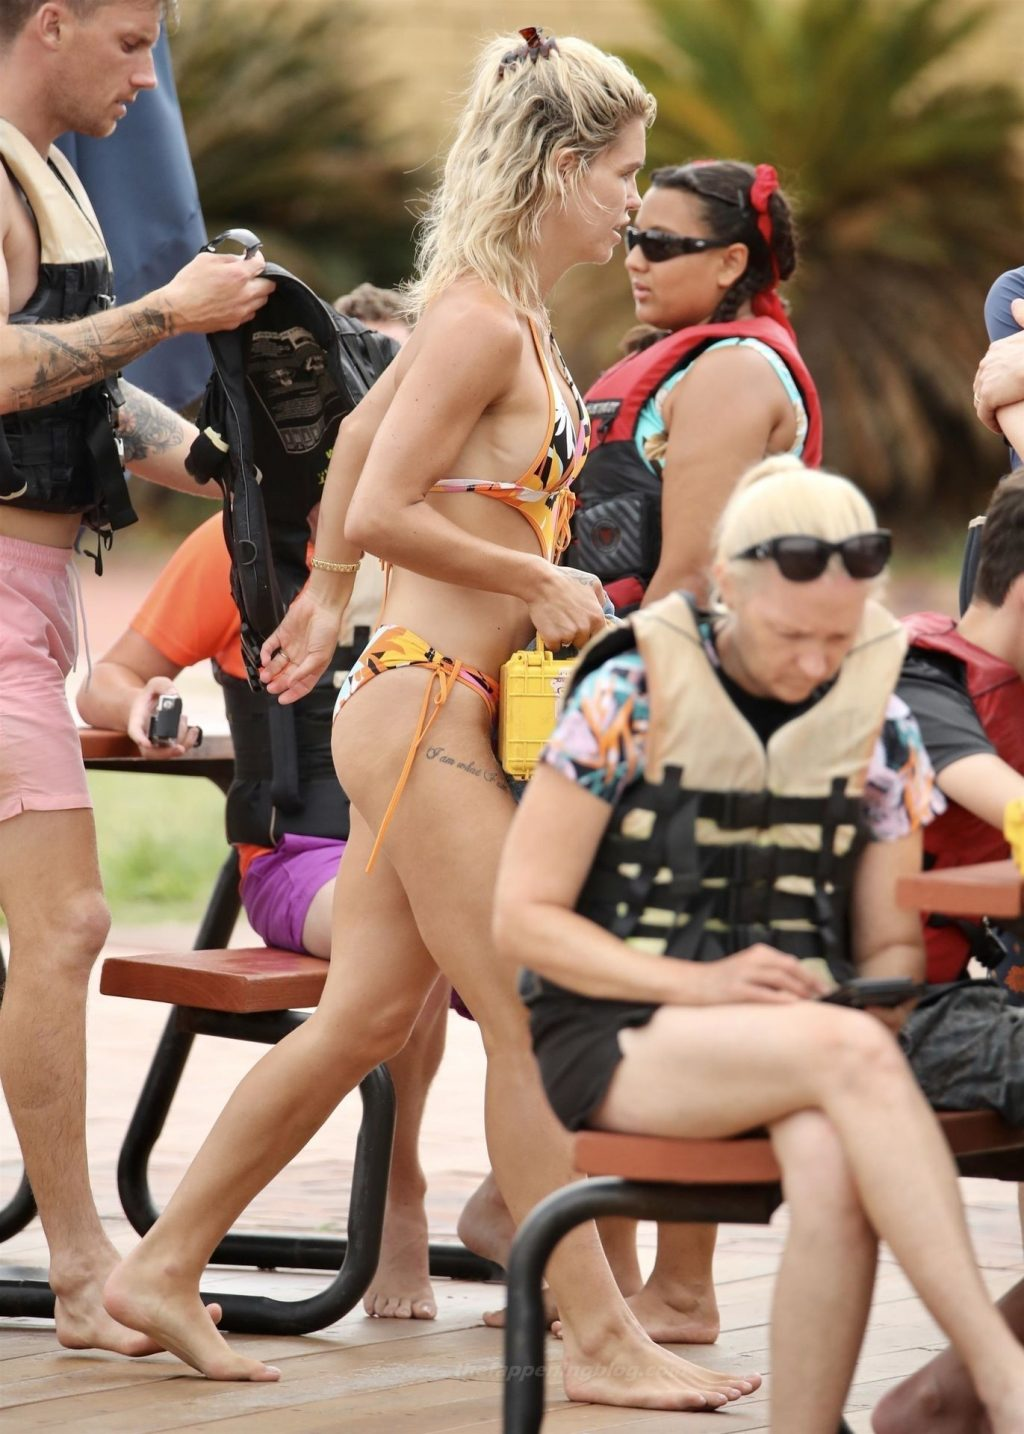 Simone Ormesher Shows Off Her Stunning Body in a Bikini (8 Photos)